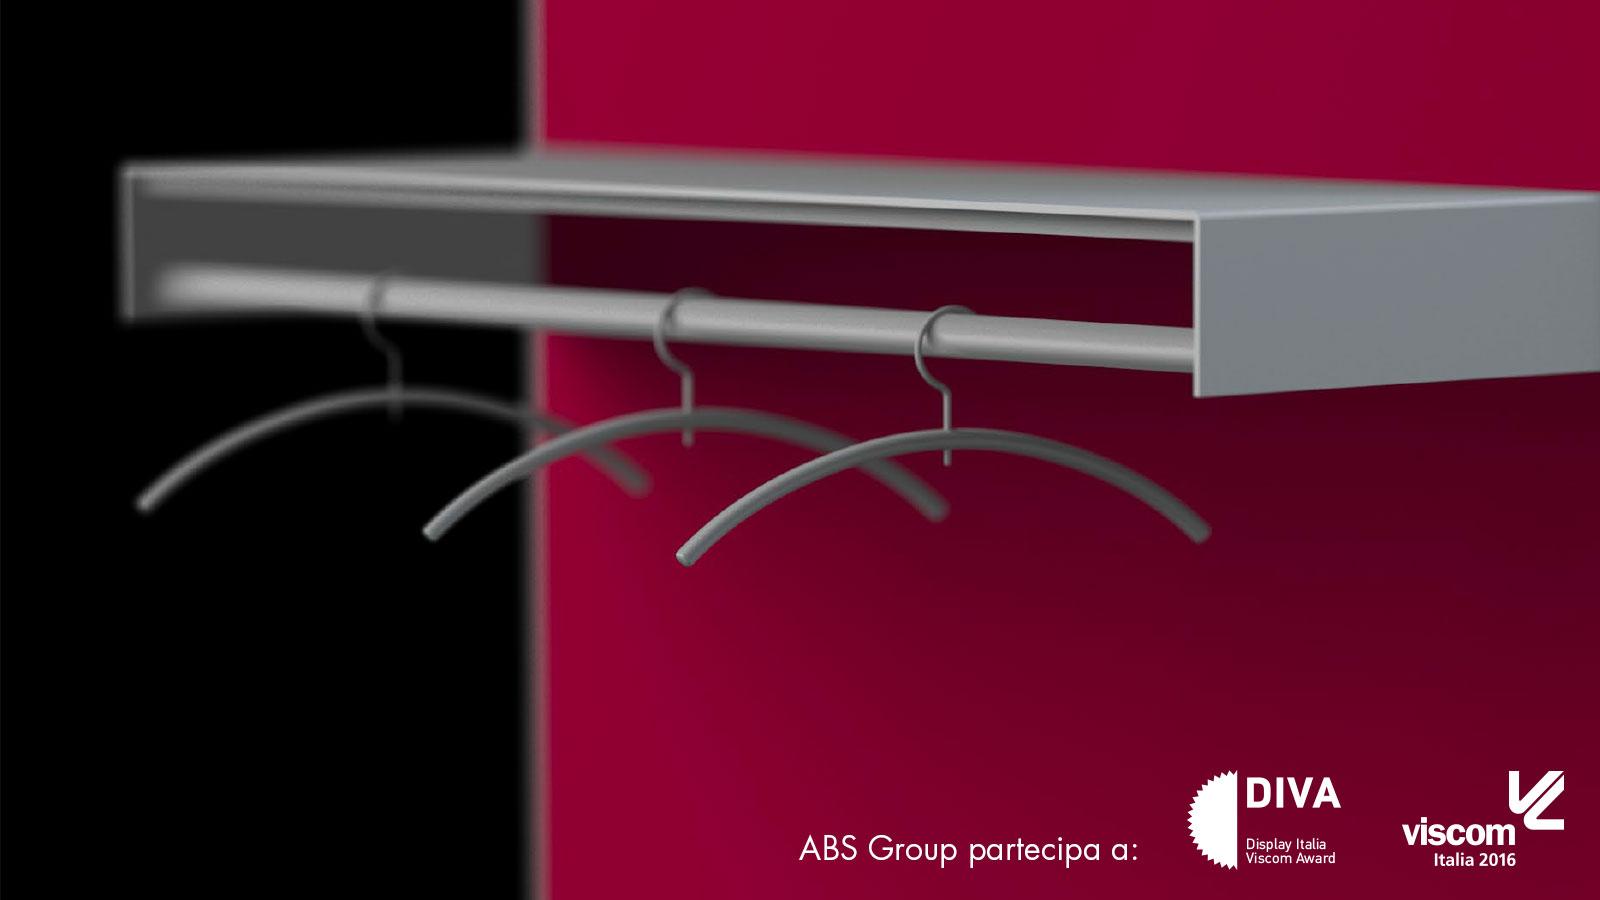 ABS Group - Viscom 2016